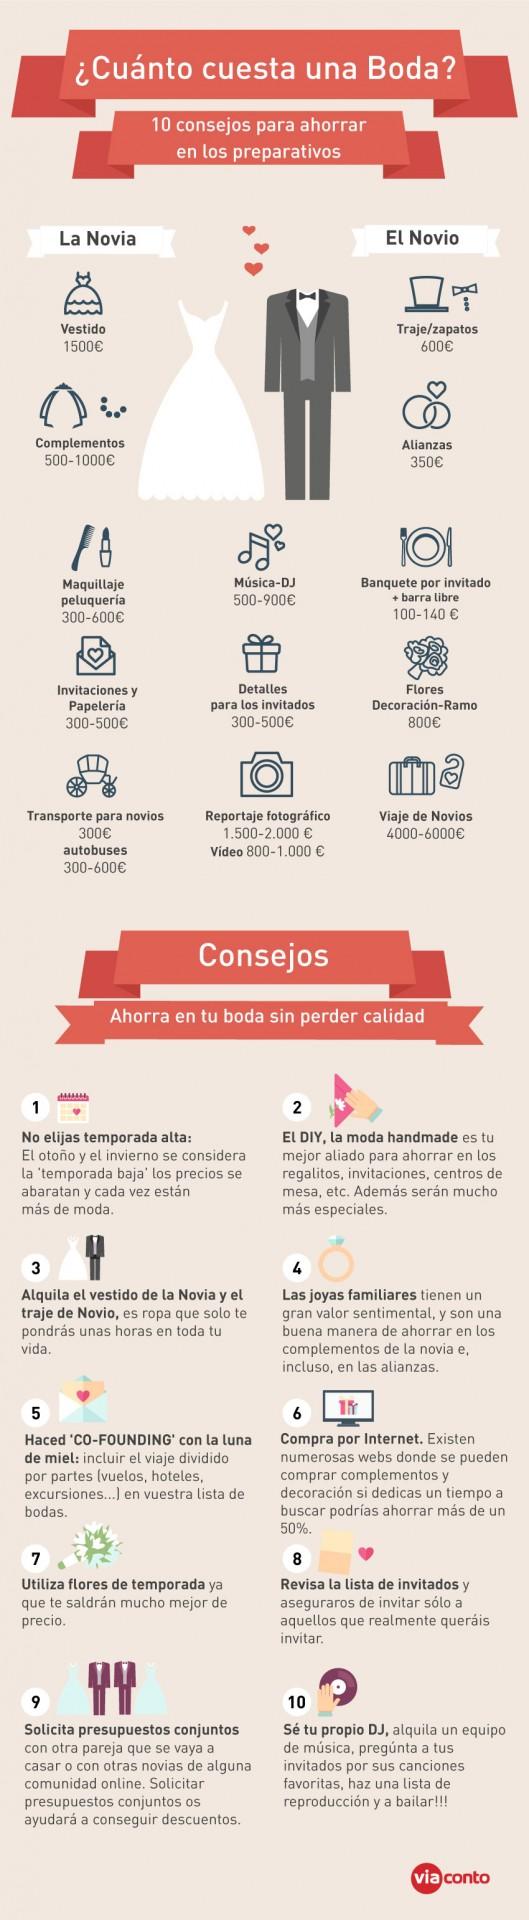 Infografi%CC%81a_cuantocuestaunaboda-jpg